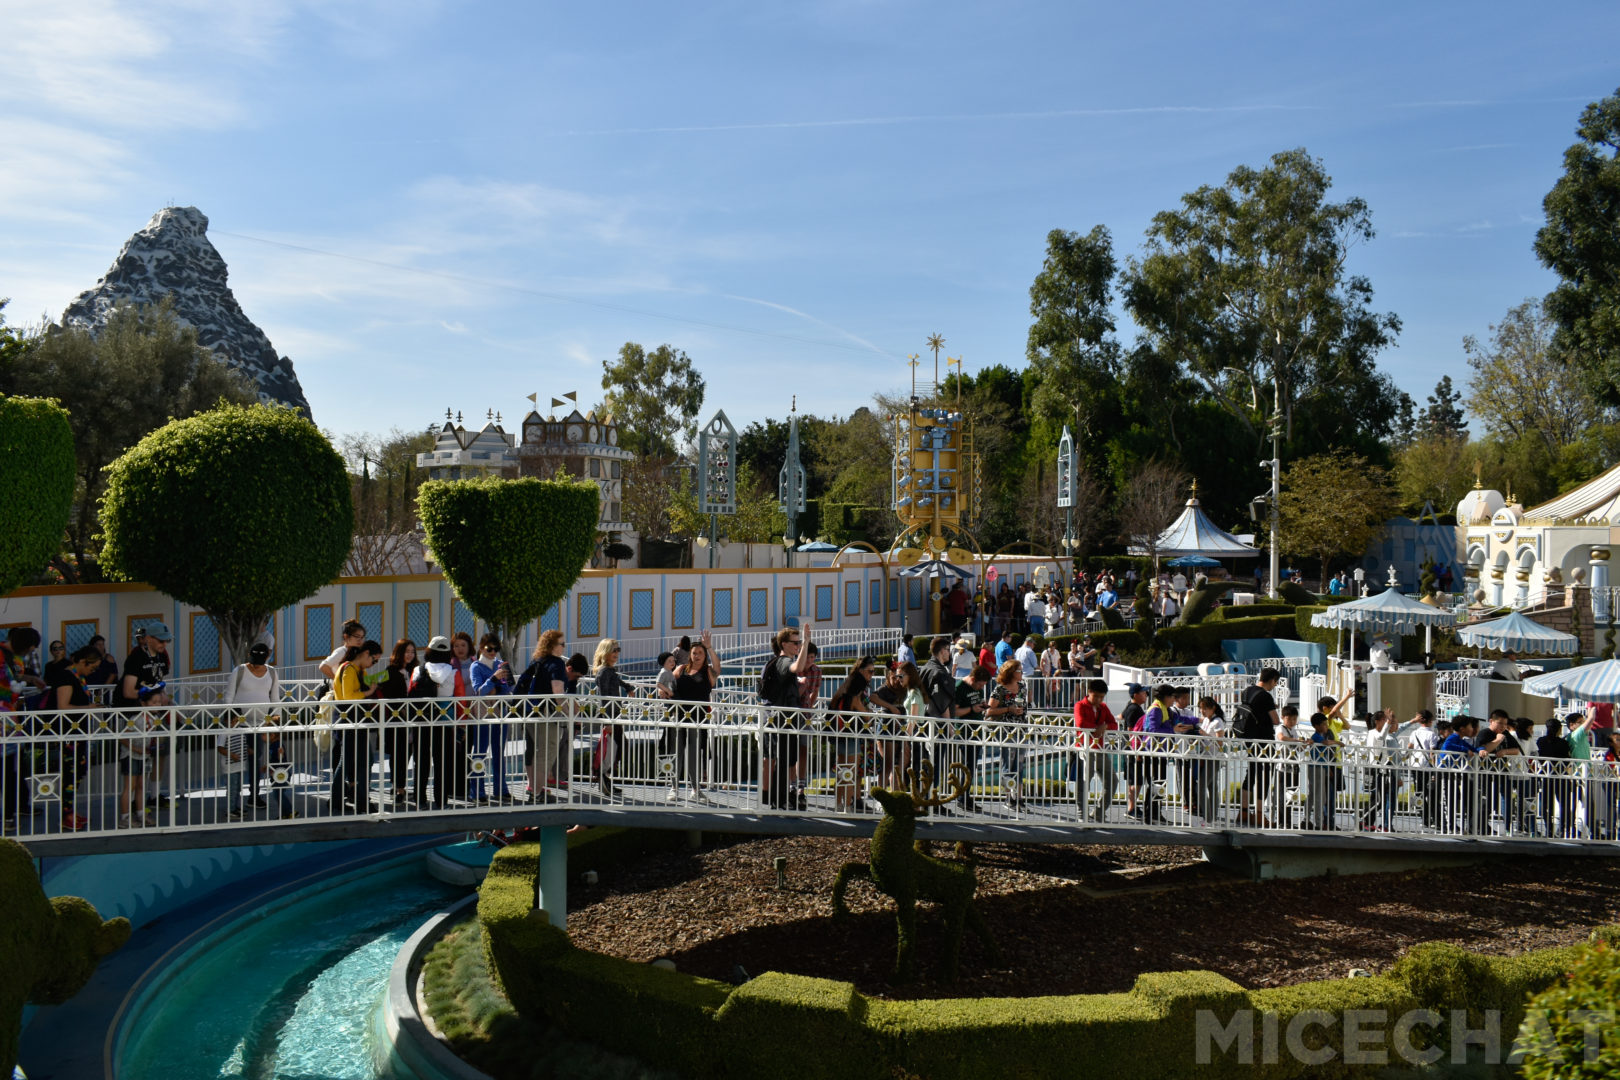 Micechat Disneyland Resort Features Disneyland Photo